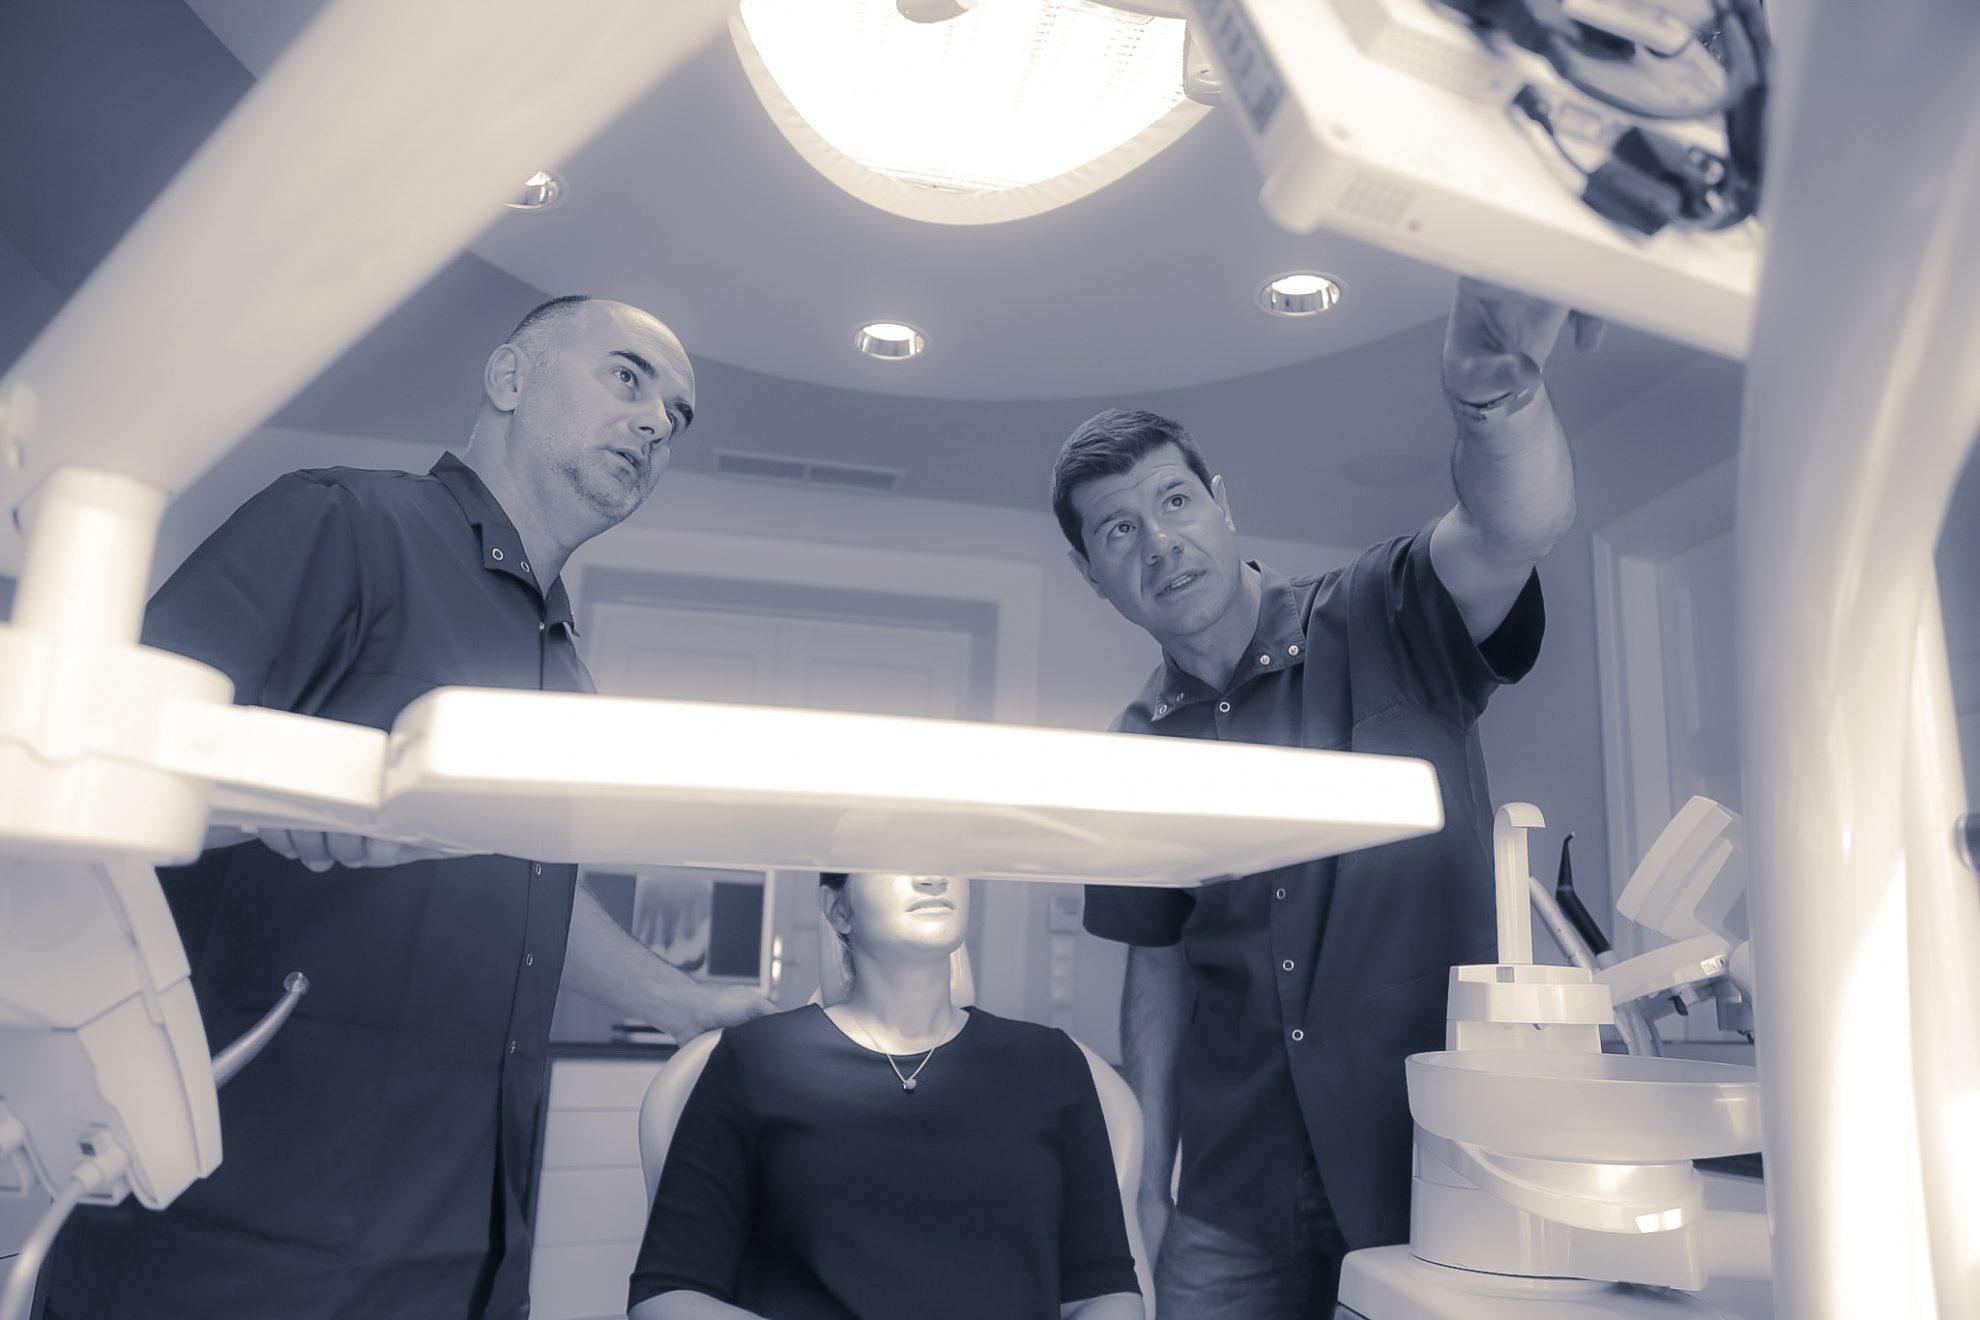 soins dentaires et dentistes Hongrie